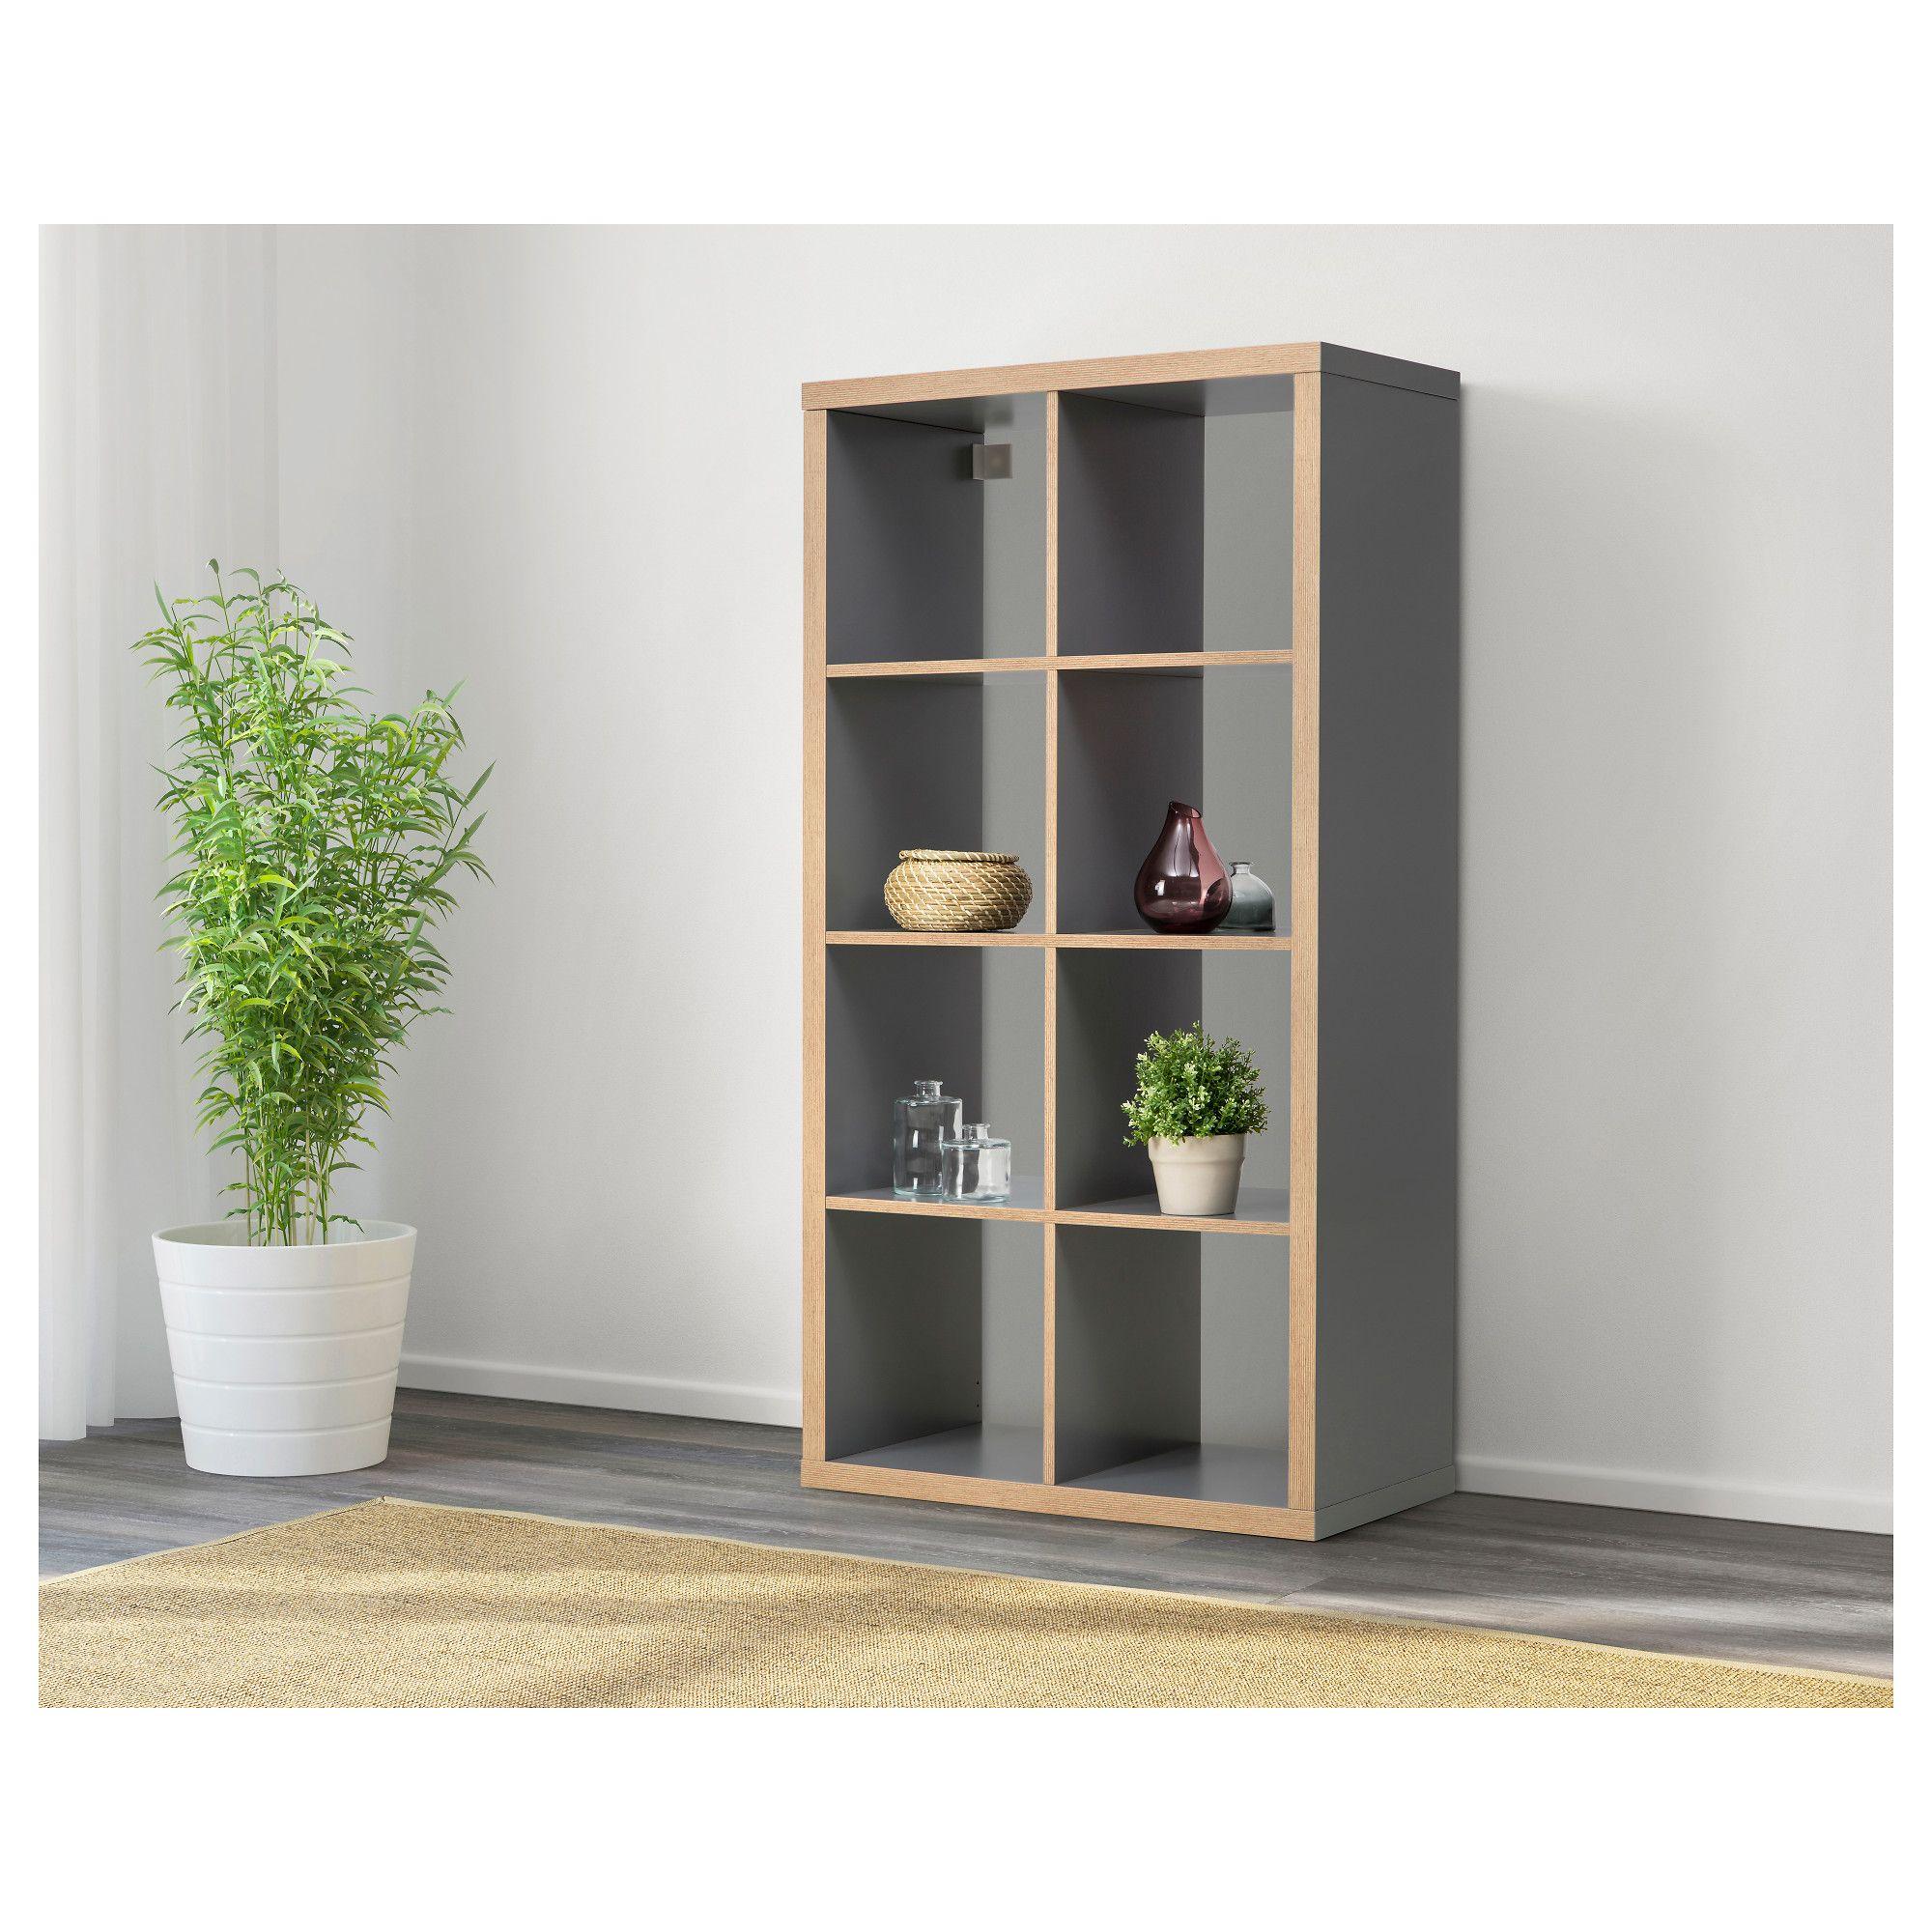 KALLAX Shelf unit gray, wood effect 30 3/8x57 7/8